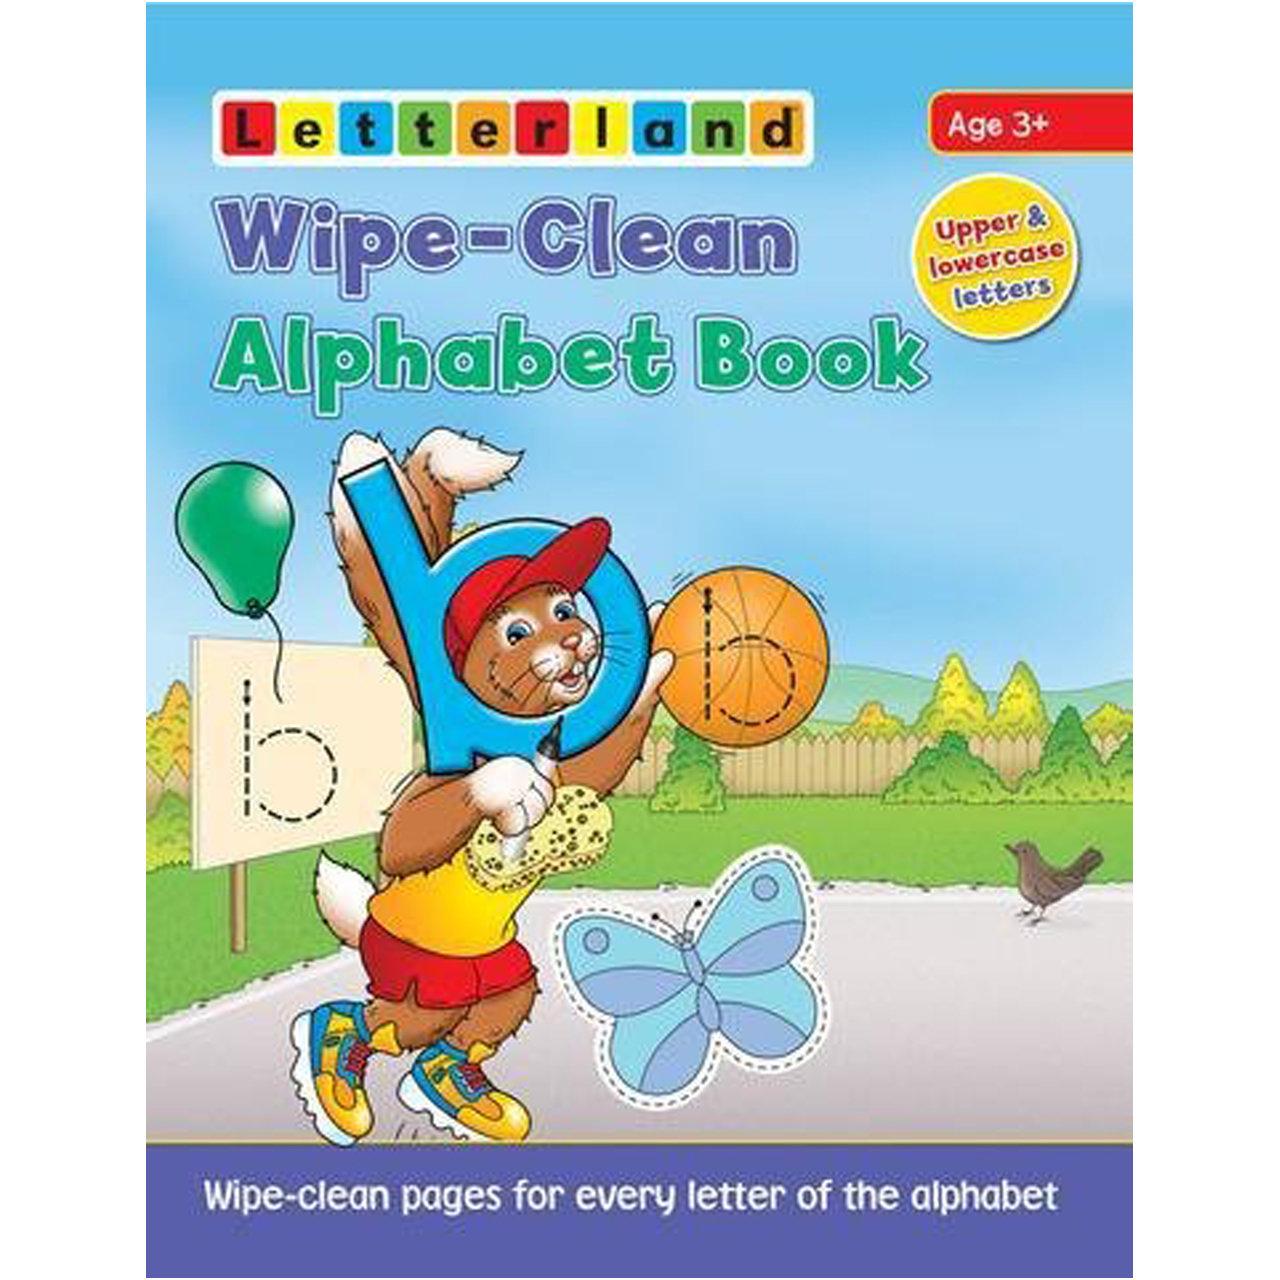 Wipe-Clean Alphabet Book